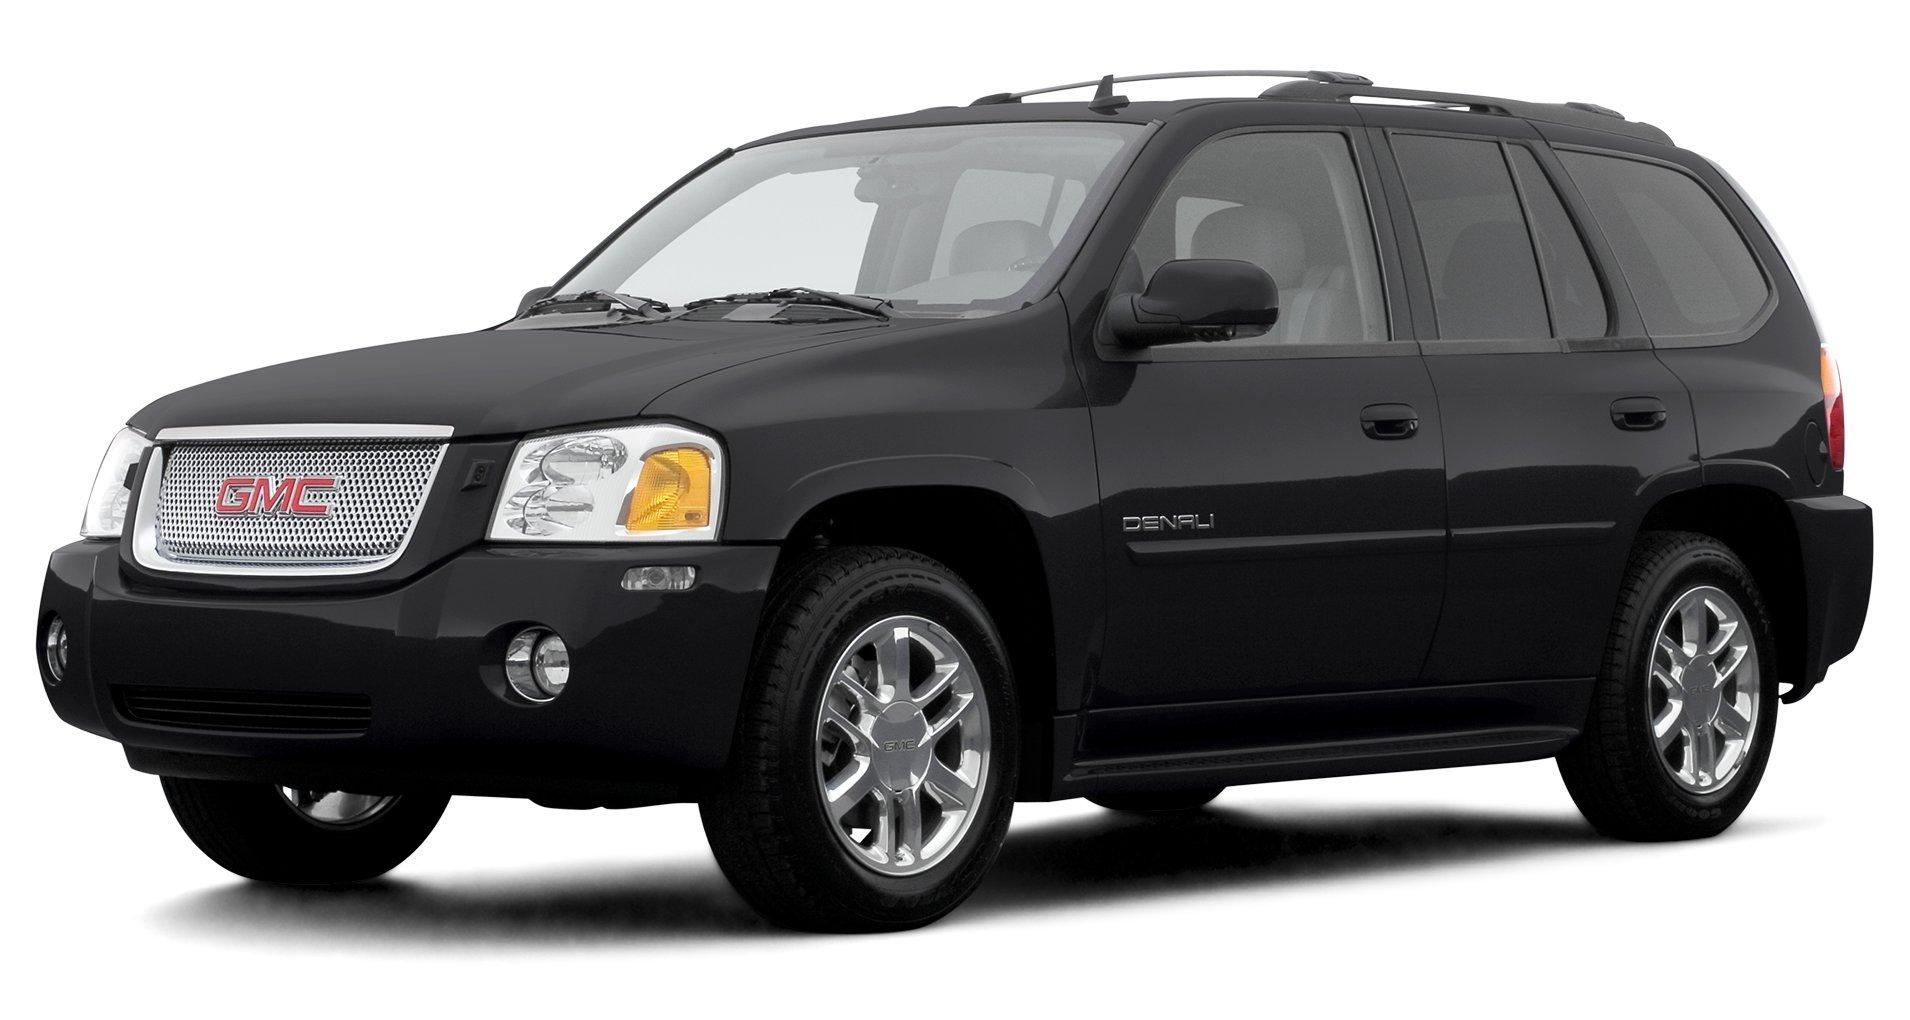 Amazon.com: 2007 GMC Envoy Reviews, Images, And Specs: Vehicles